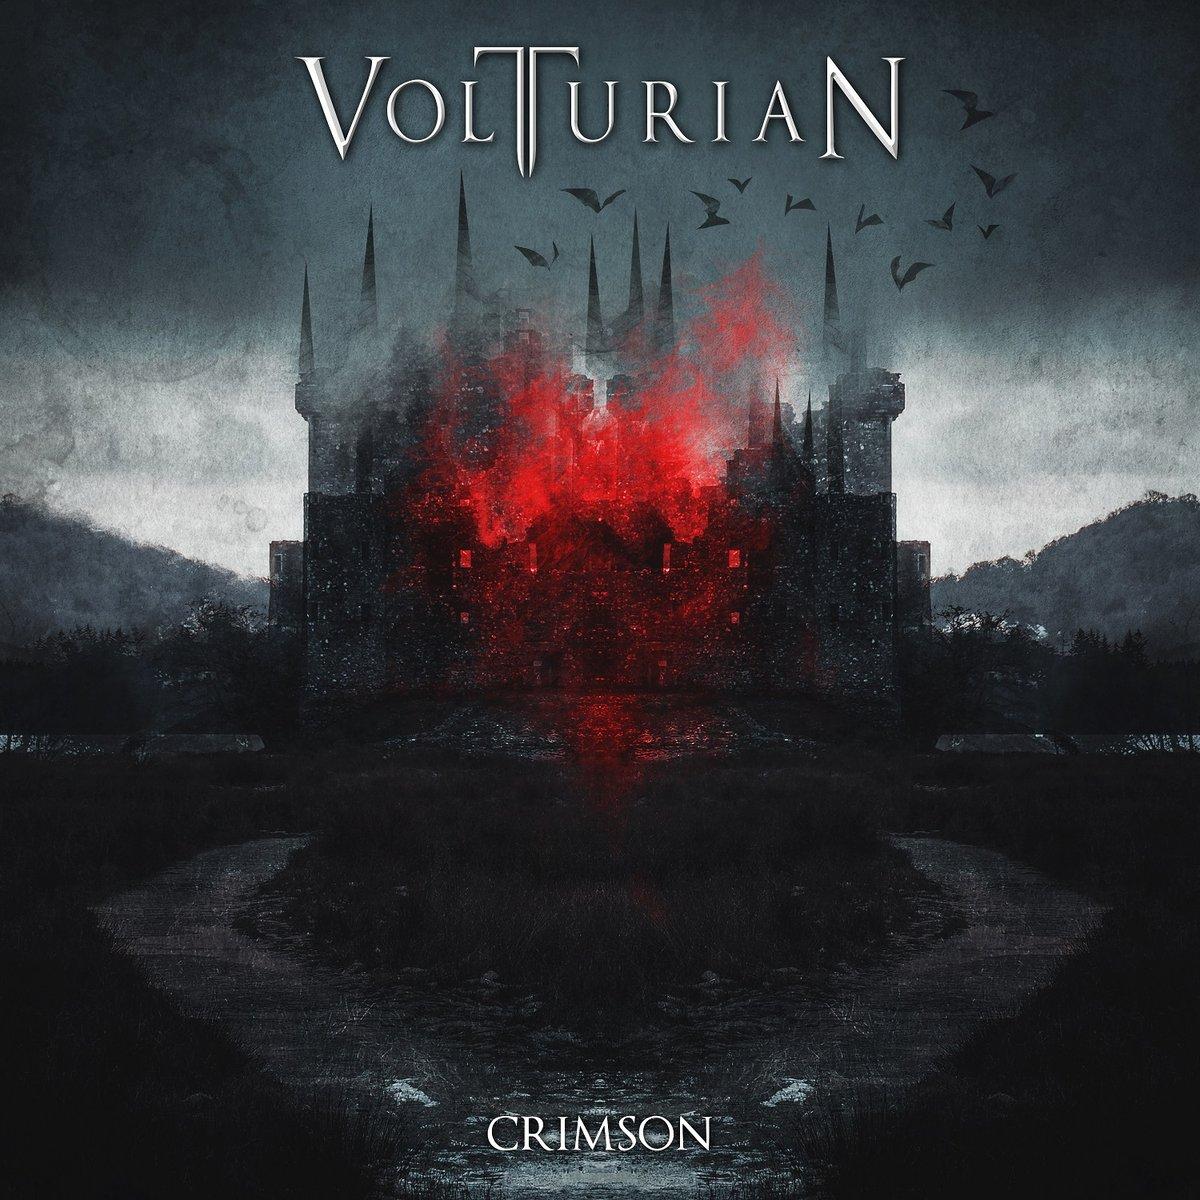 VOLTURIAN - Crimson - CD Digipack